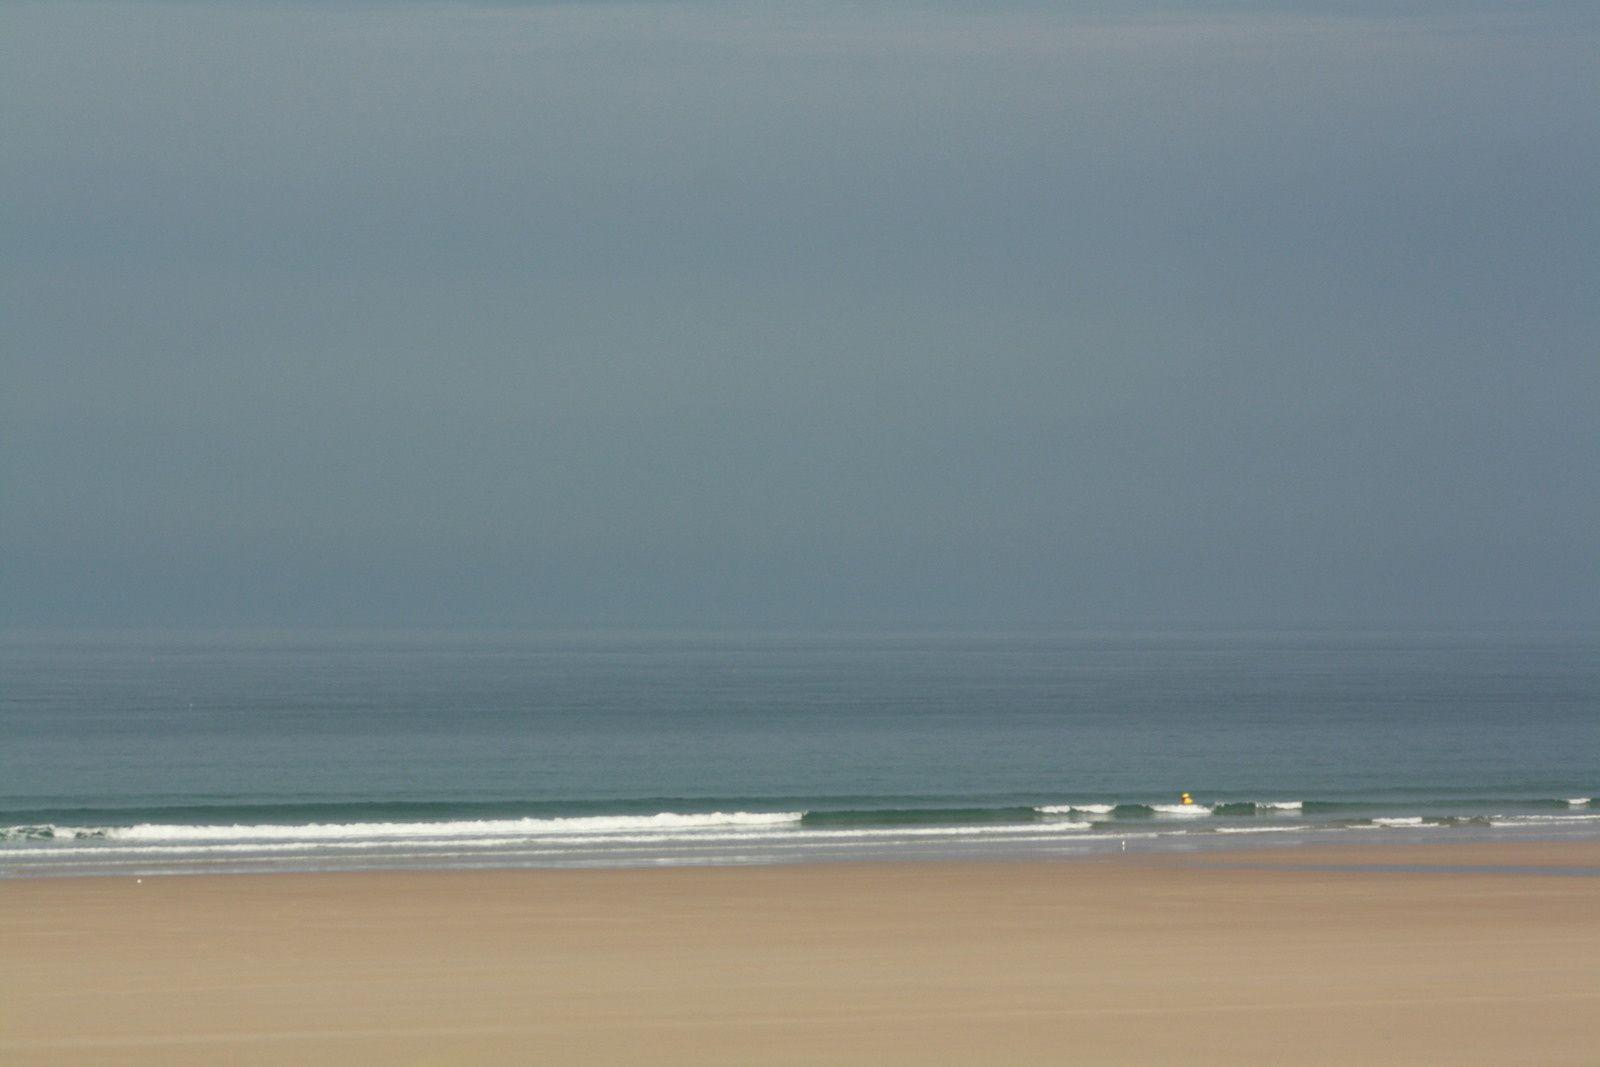 Petites vagues propres, vent O faible